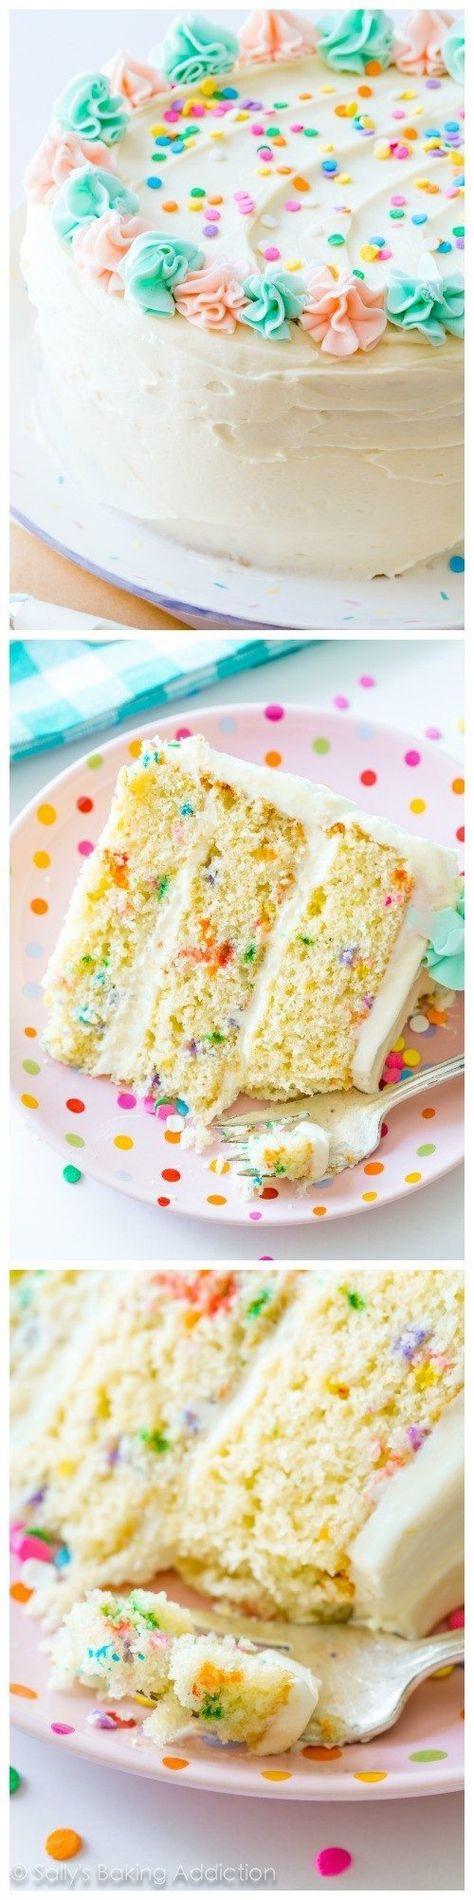 Funfetti Layer Cake   Sally's Baking Addiction